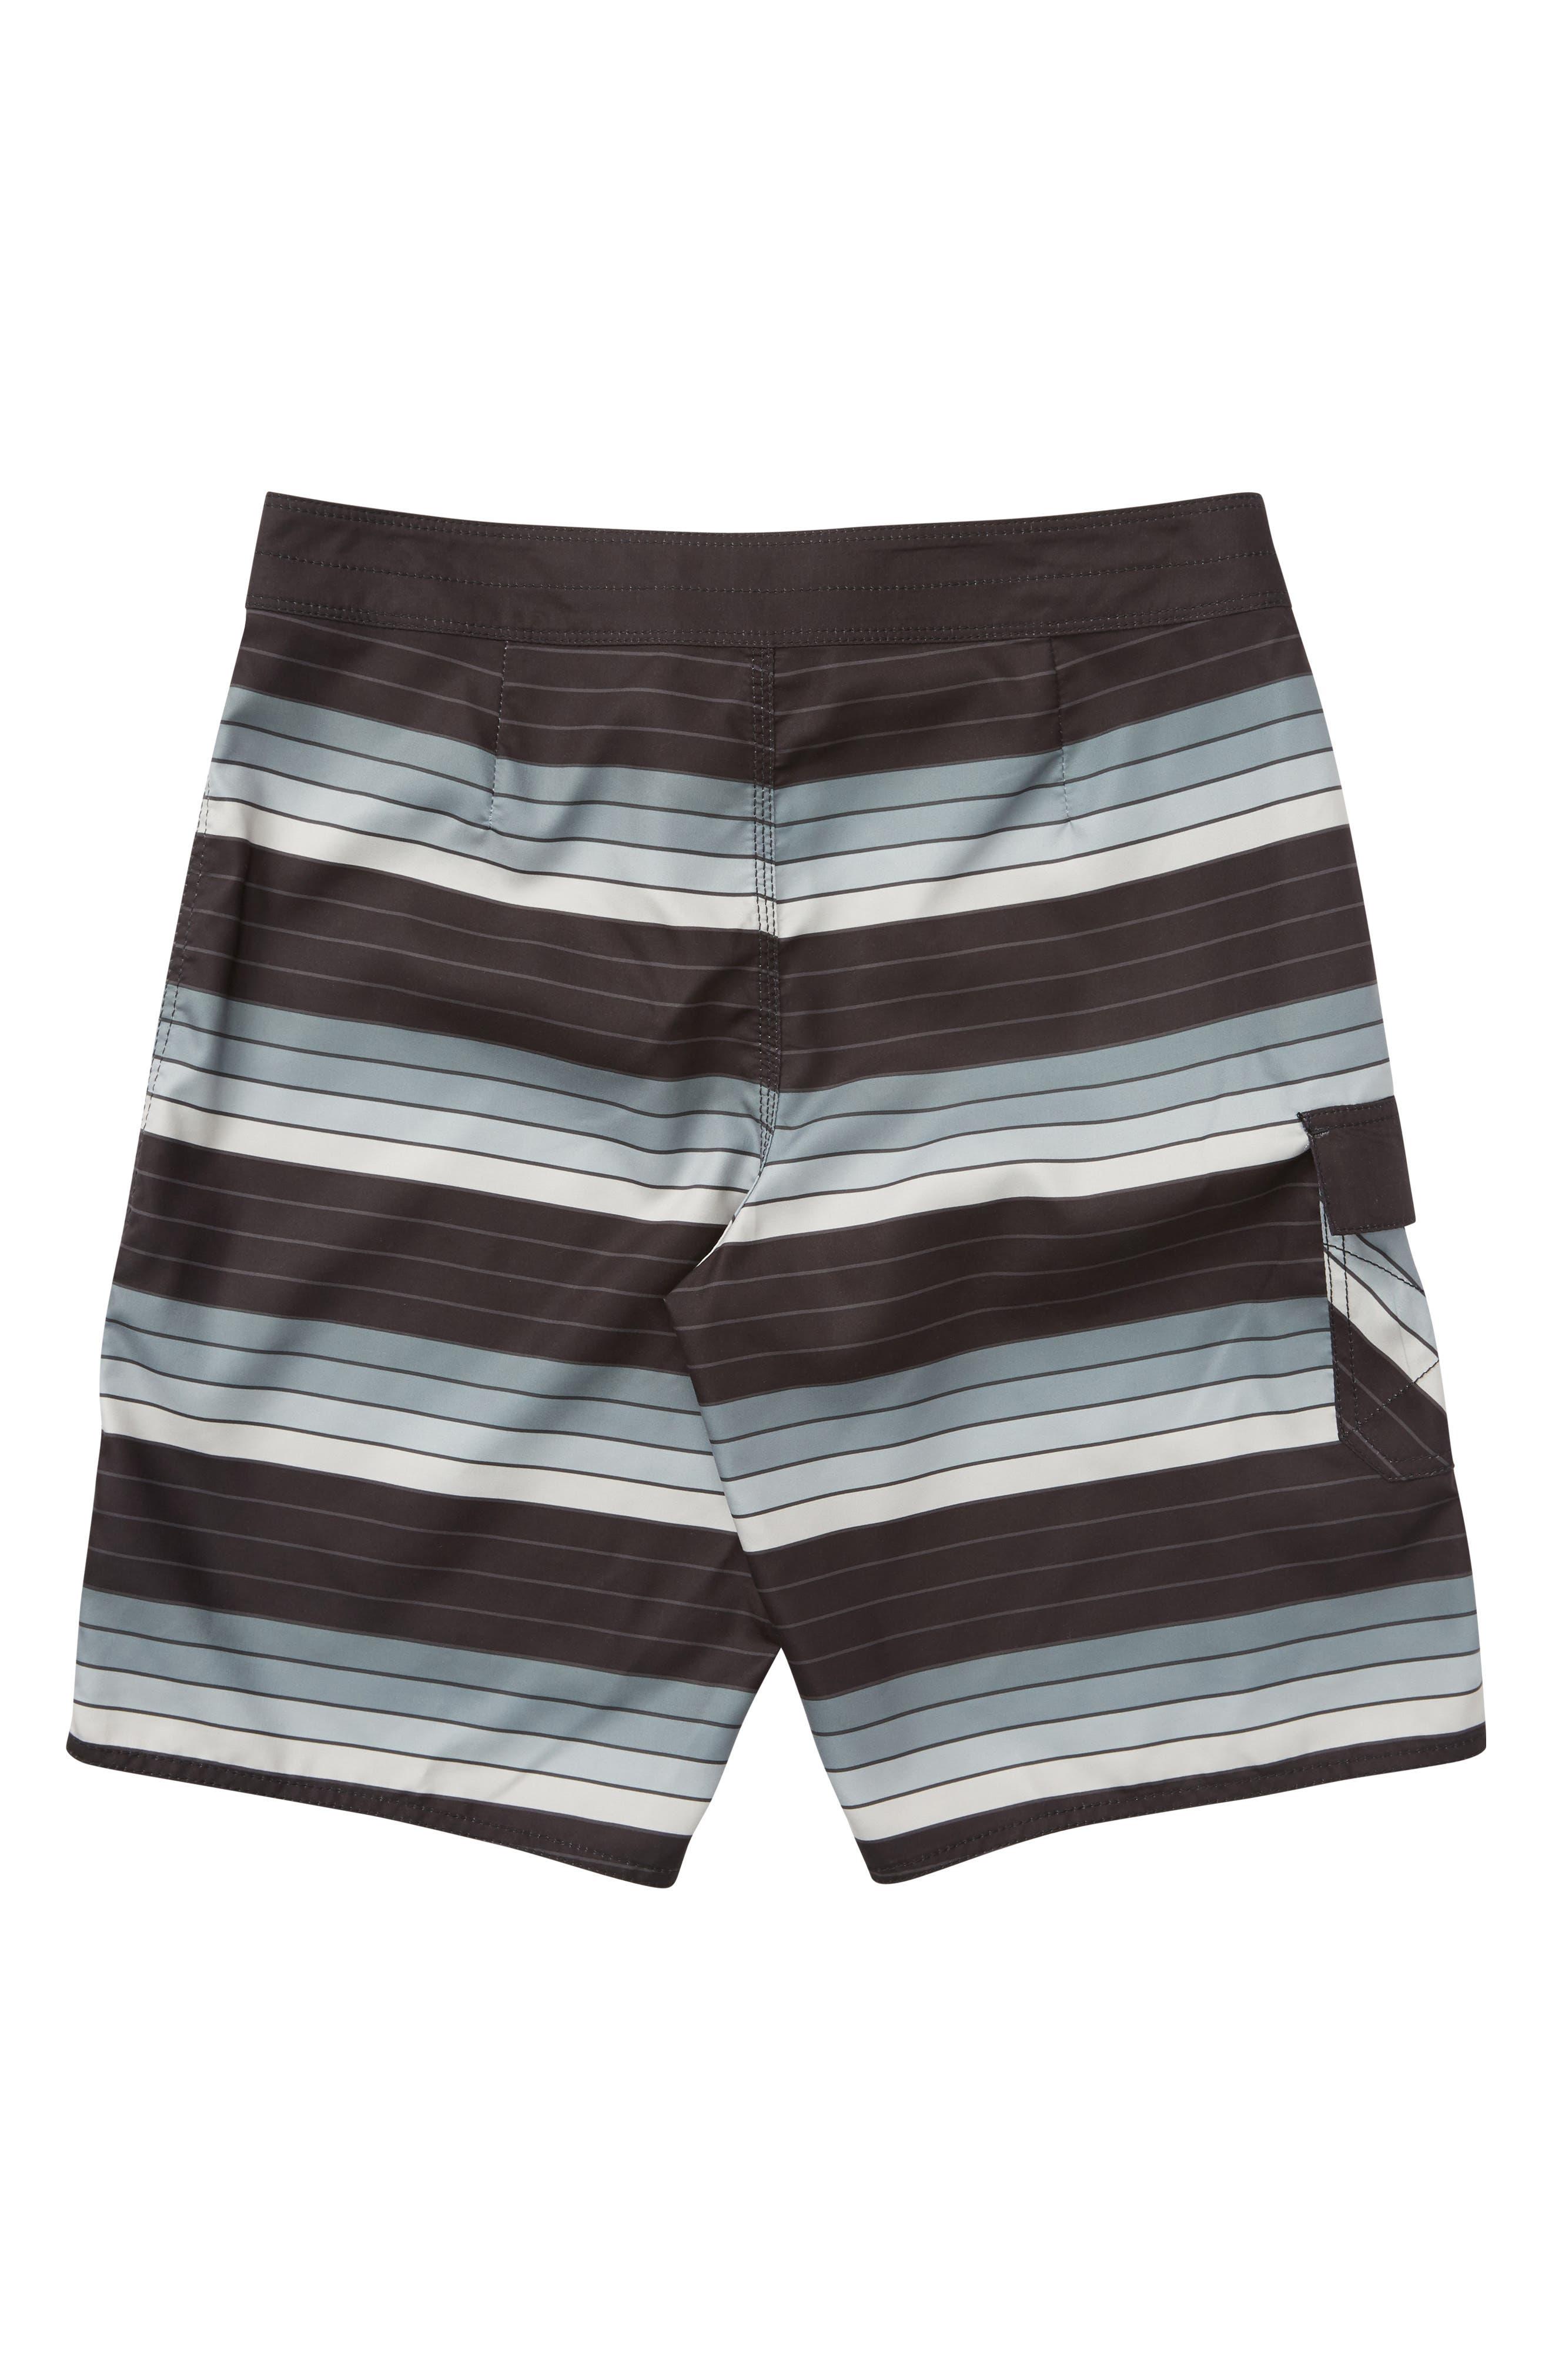 All Day OG Stripe Board Shorts,                             Alternate thumbnail 2, color,                             SILVER